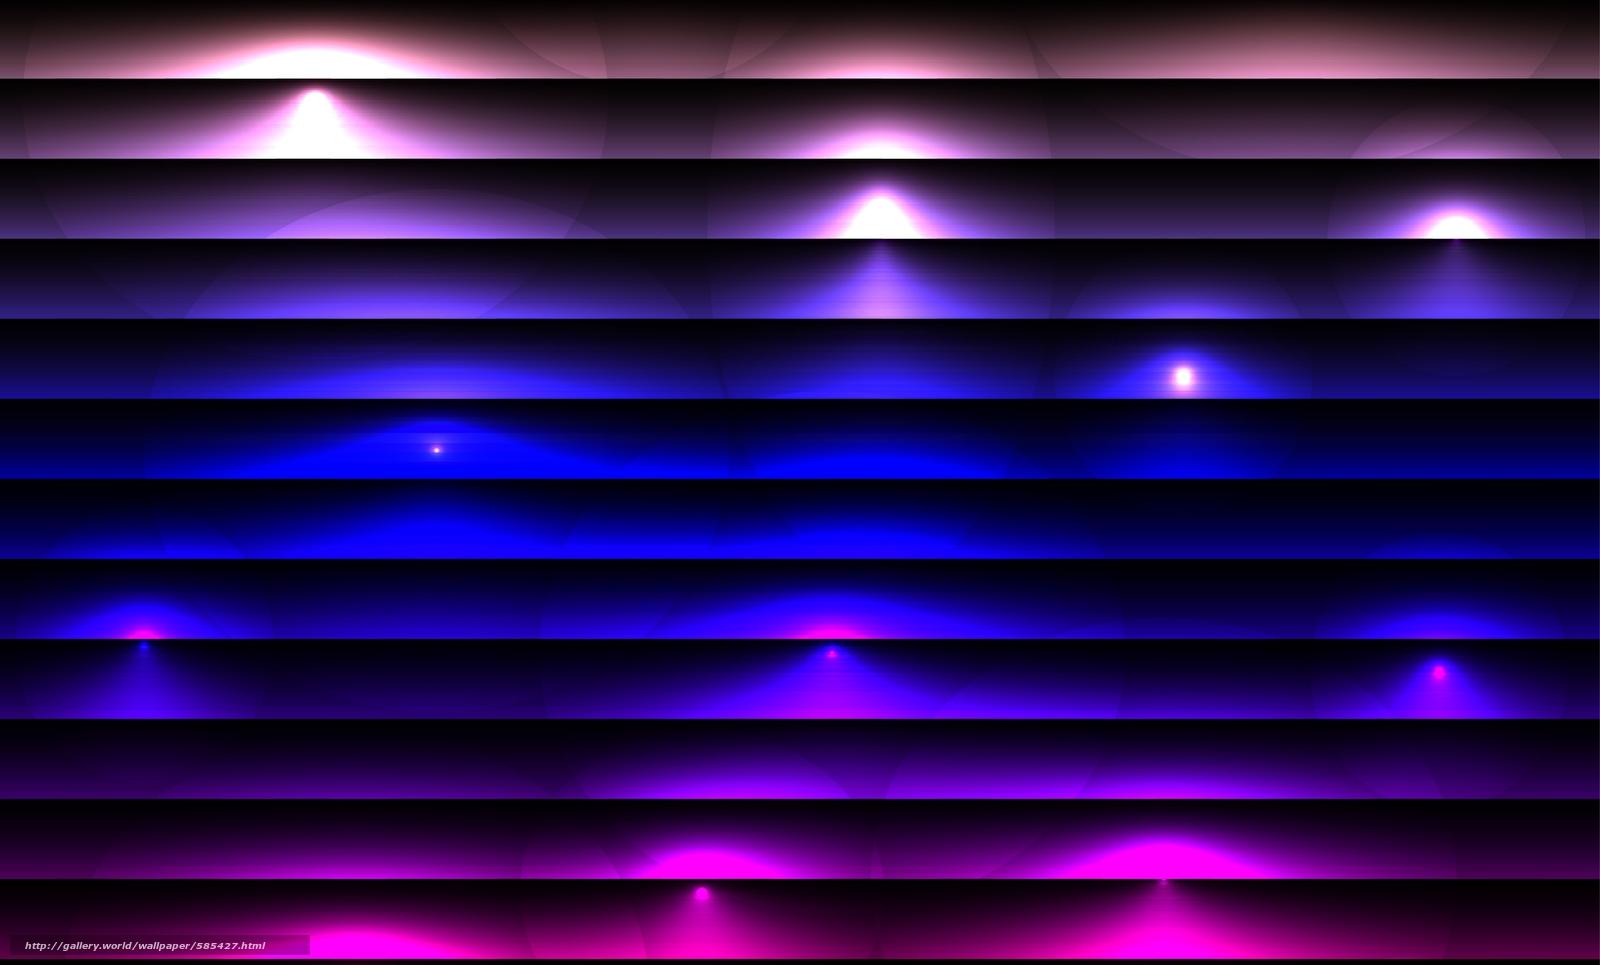 Tlcharger fond d 39 ecran multicolore abstraction bande for Bureau fond d ecran